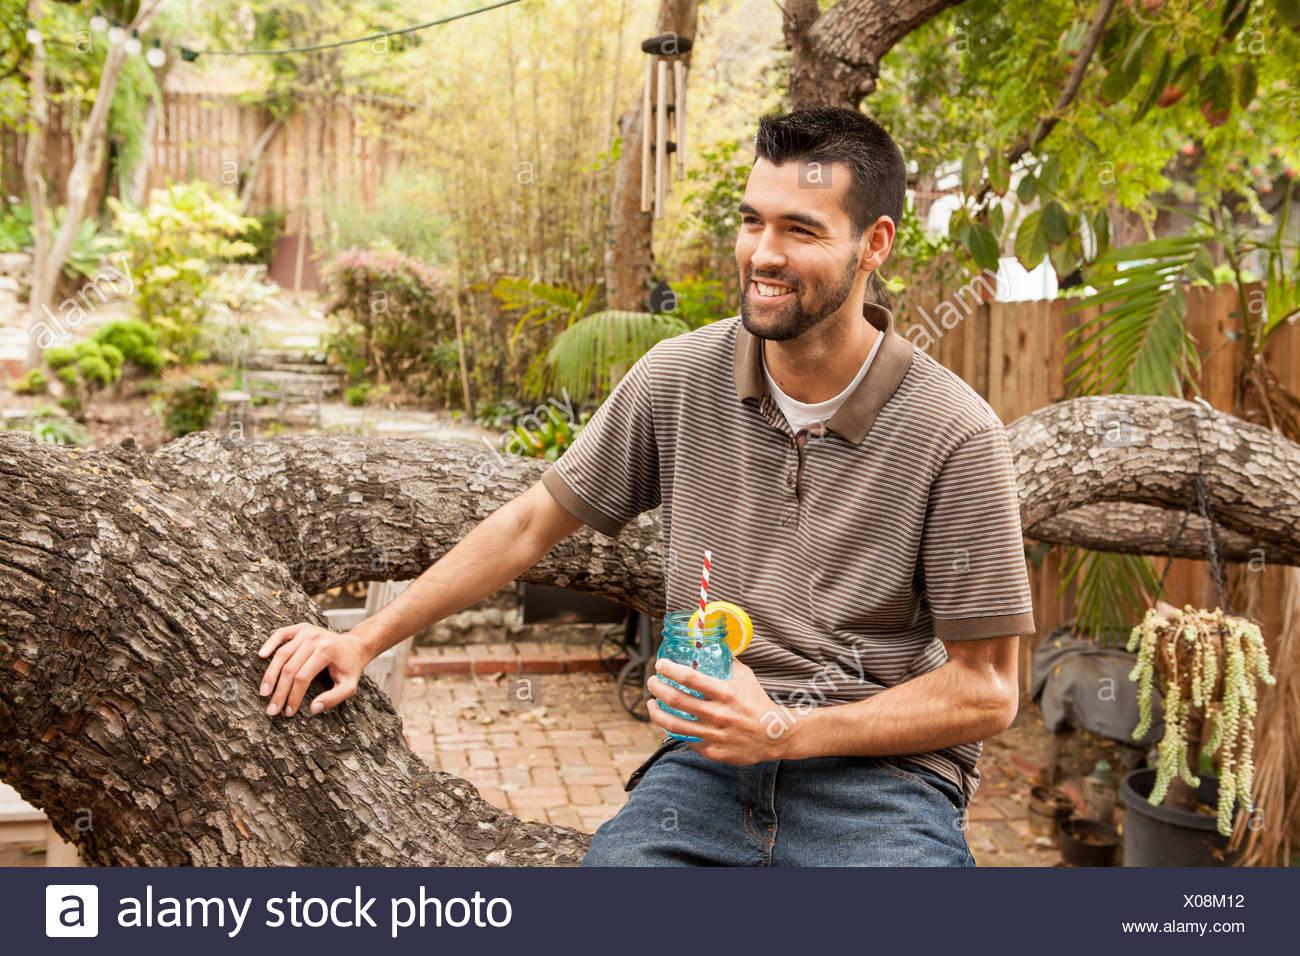 Man sitting on branch in garden having a drink - Stock Image